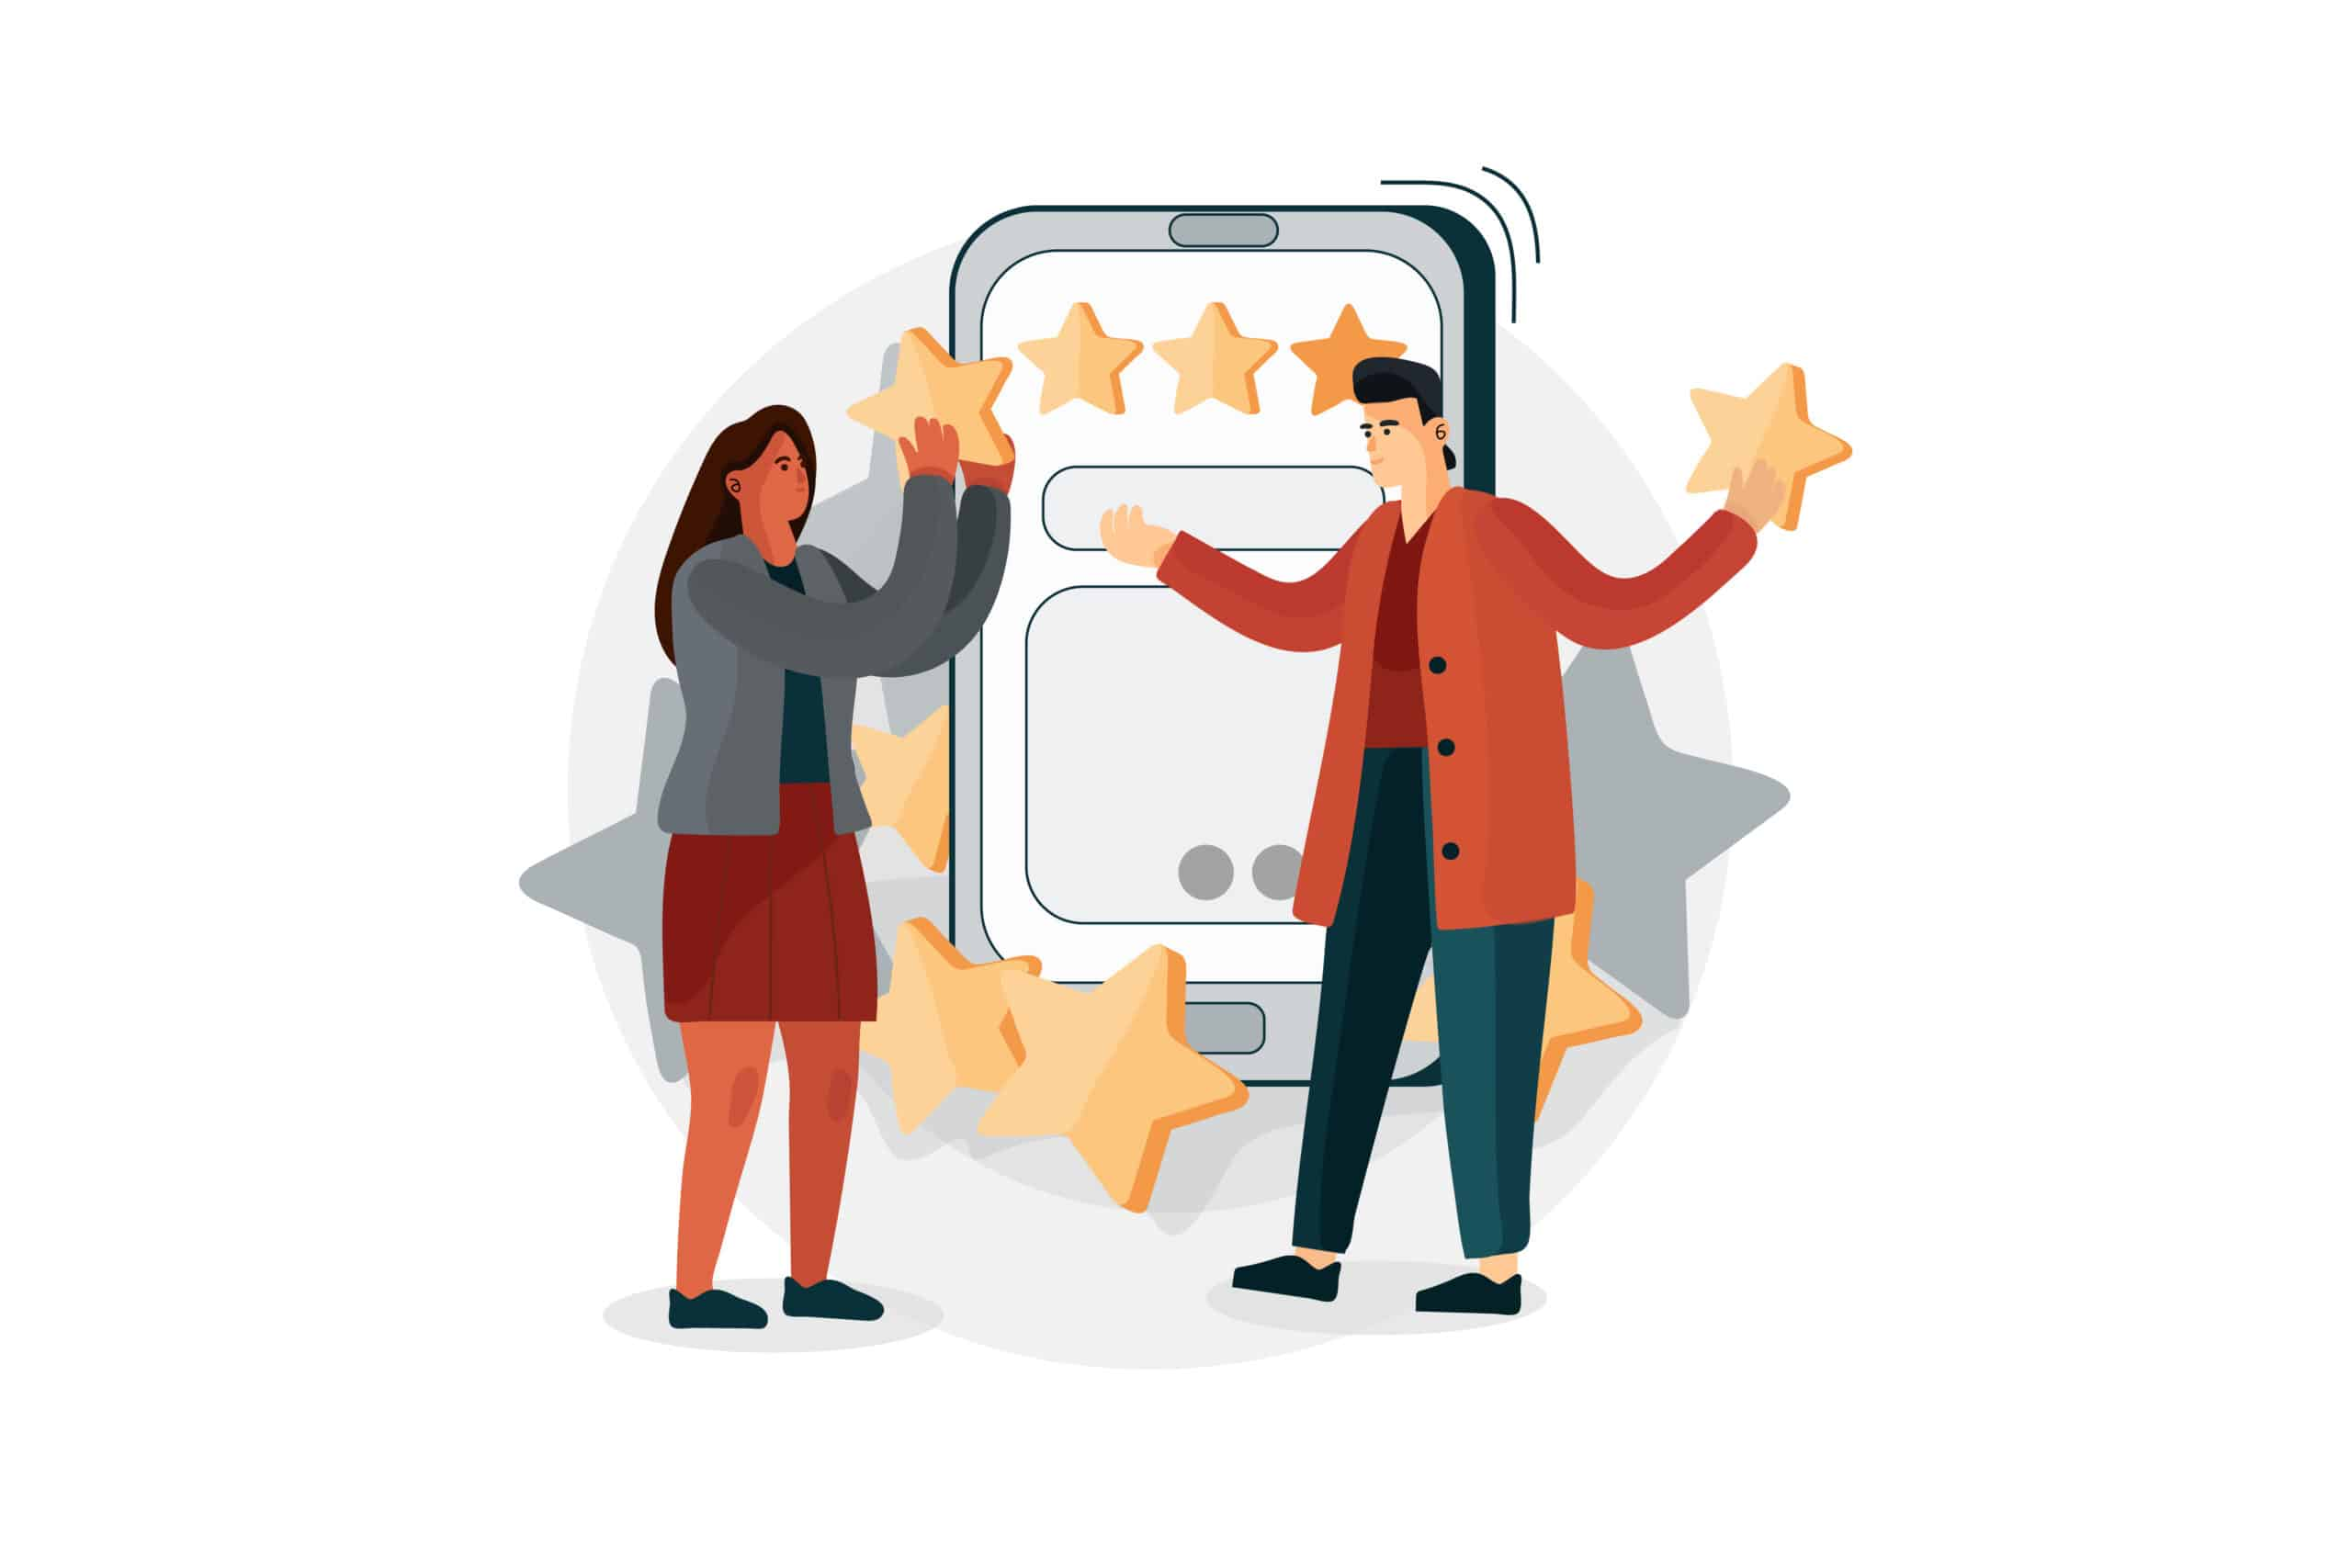 Servicenow vs Salesforce vs Messenger Bot, Service management process, Customer relationship management software, Customer relationship management, Comparisons between Servicenow, Salesforce, and Messenger bot, Service management tool, Which is better?